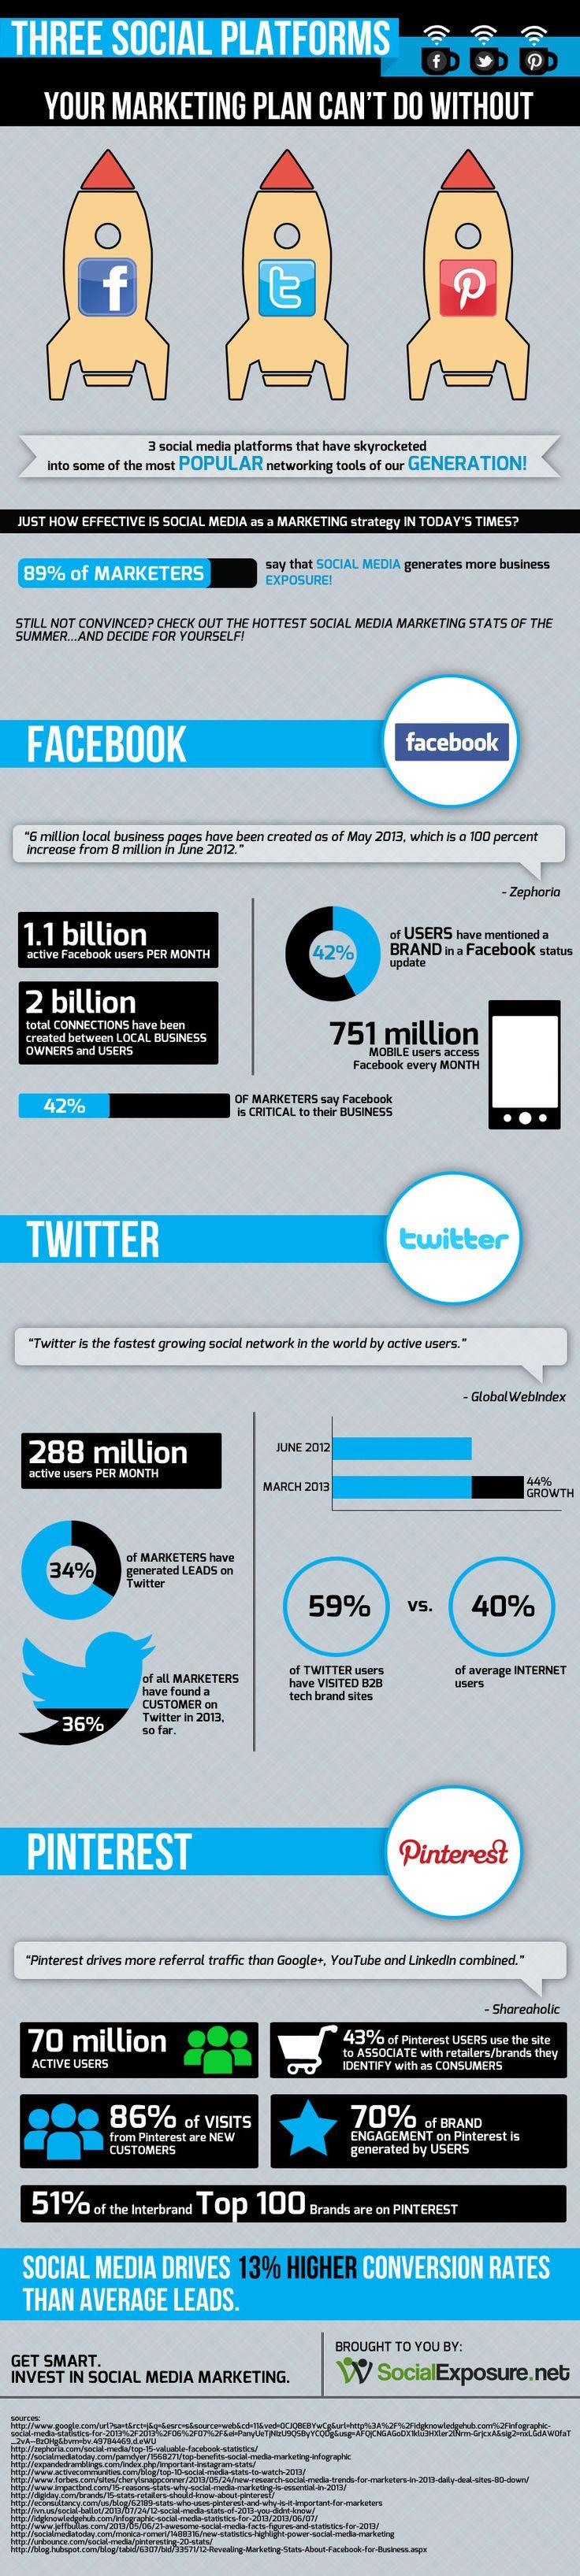 Ningún Plan de Marketing sin FaceBook, Twitter y Pinterest #infografia #socialmedia